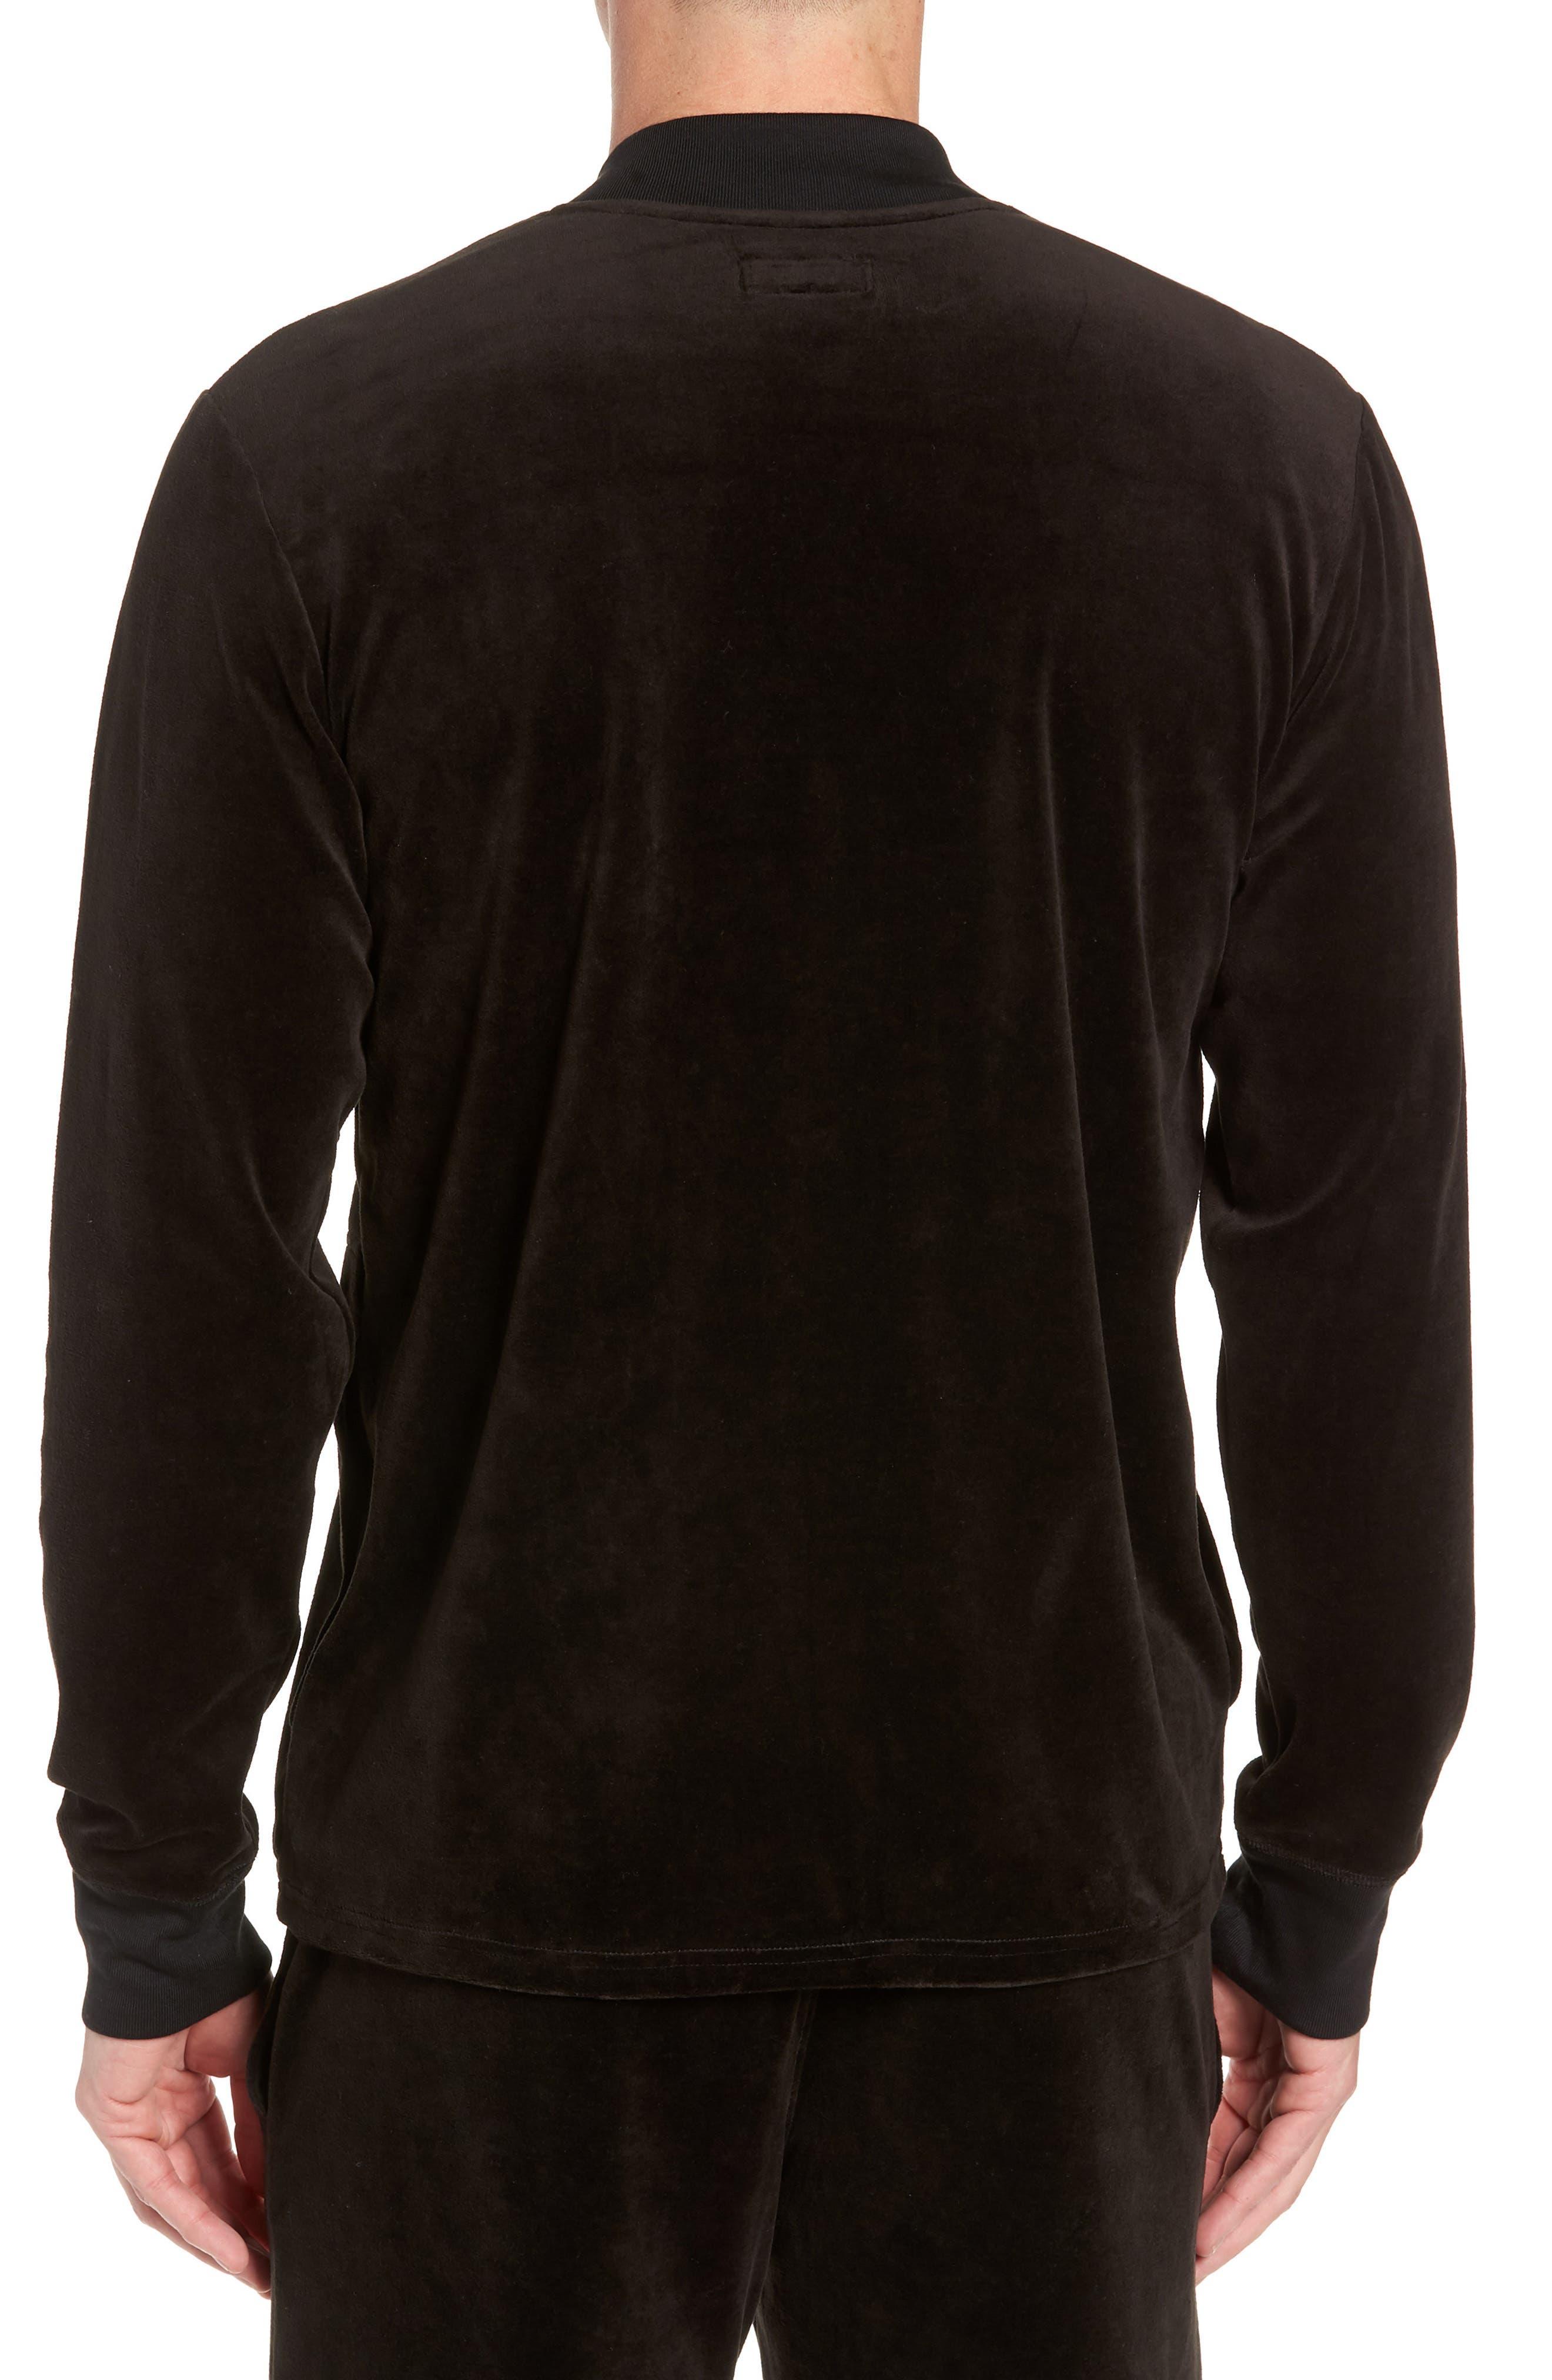 Velour Jacket,                             Alternate thumbnail 2, color,                             POLO BLACK